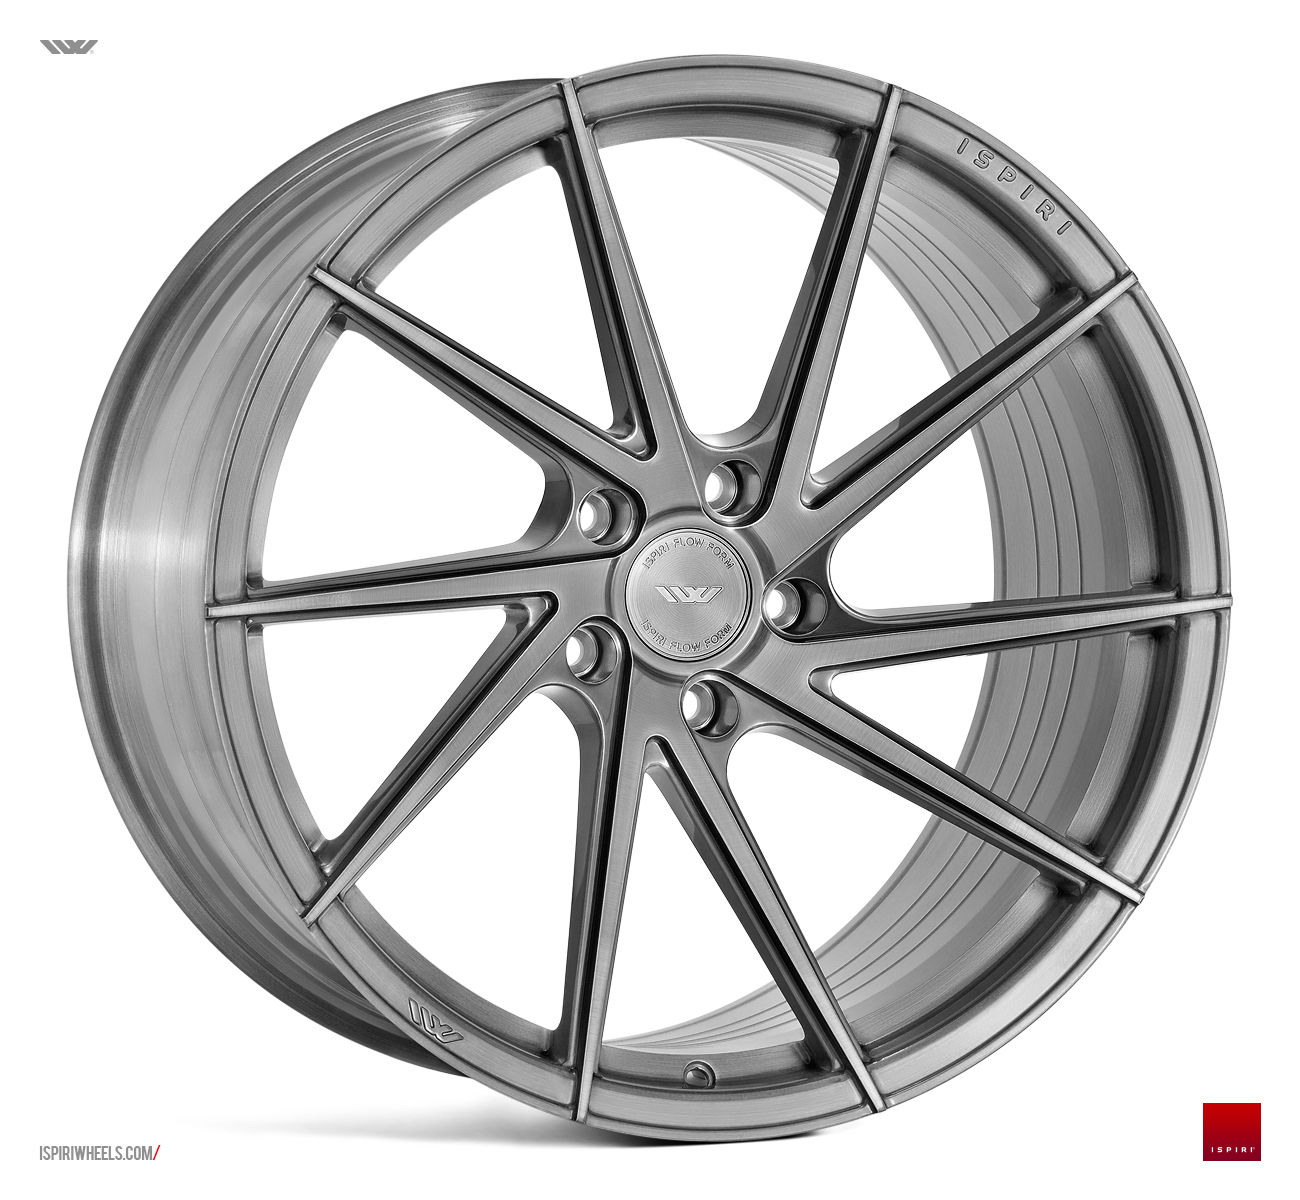 "20"" ISPIRI FFR1D Wheels - Full Brushed Carbon Titanium - VW / Audi / Mercedes - 5x112"